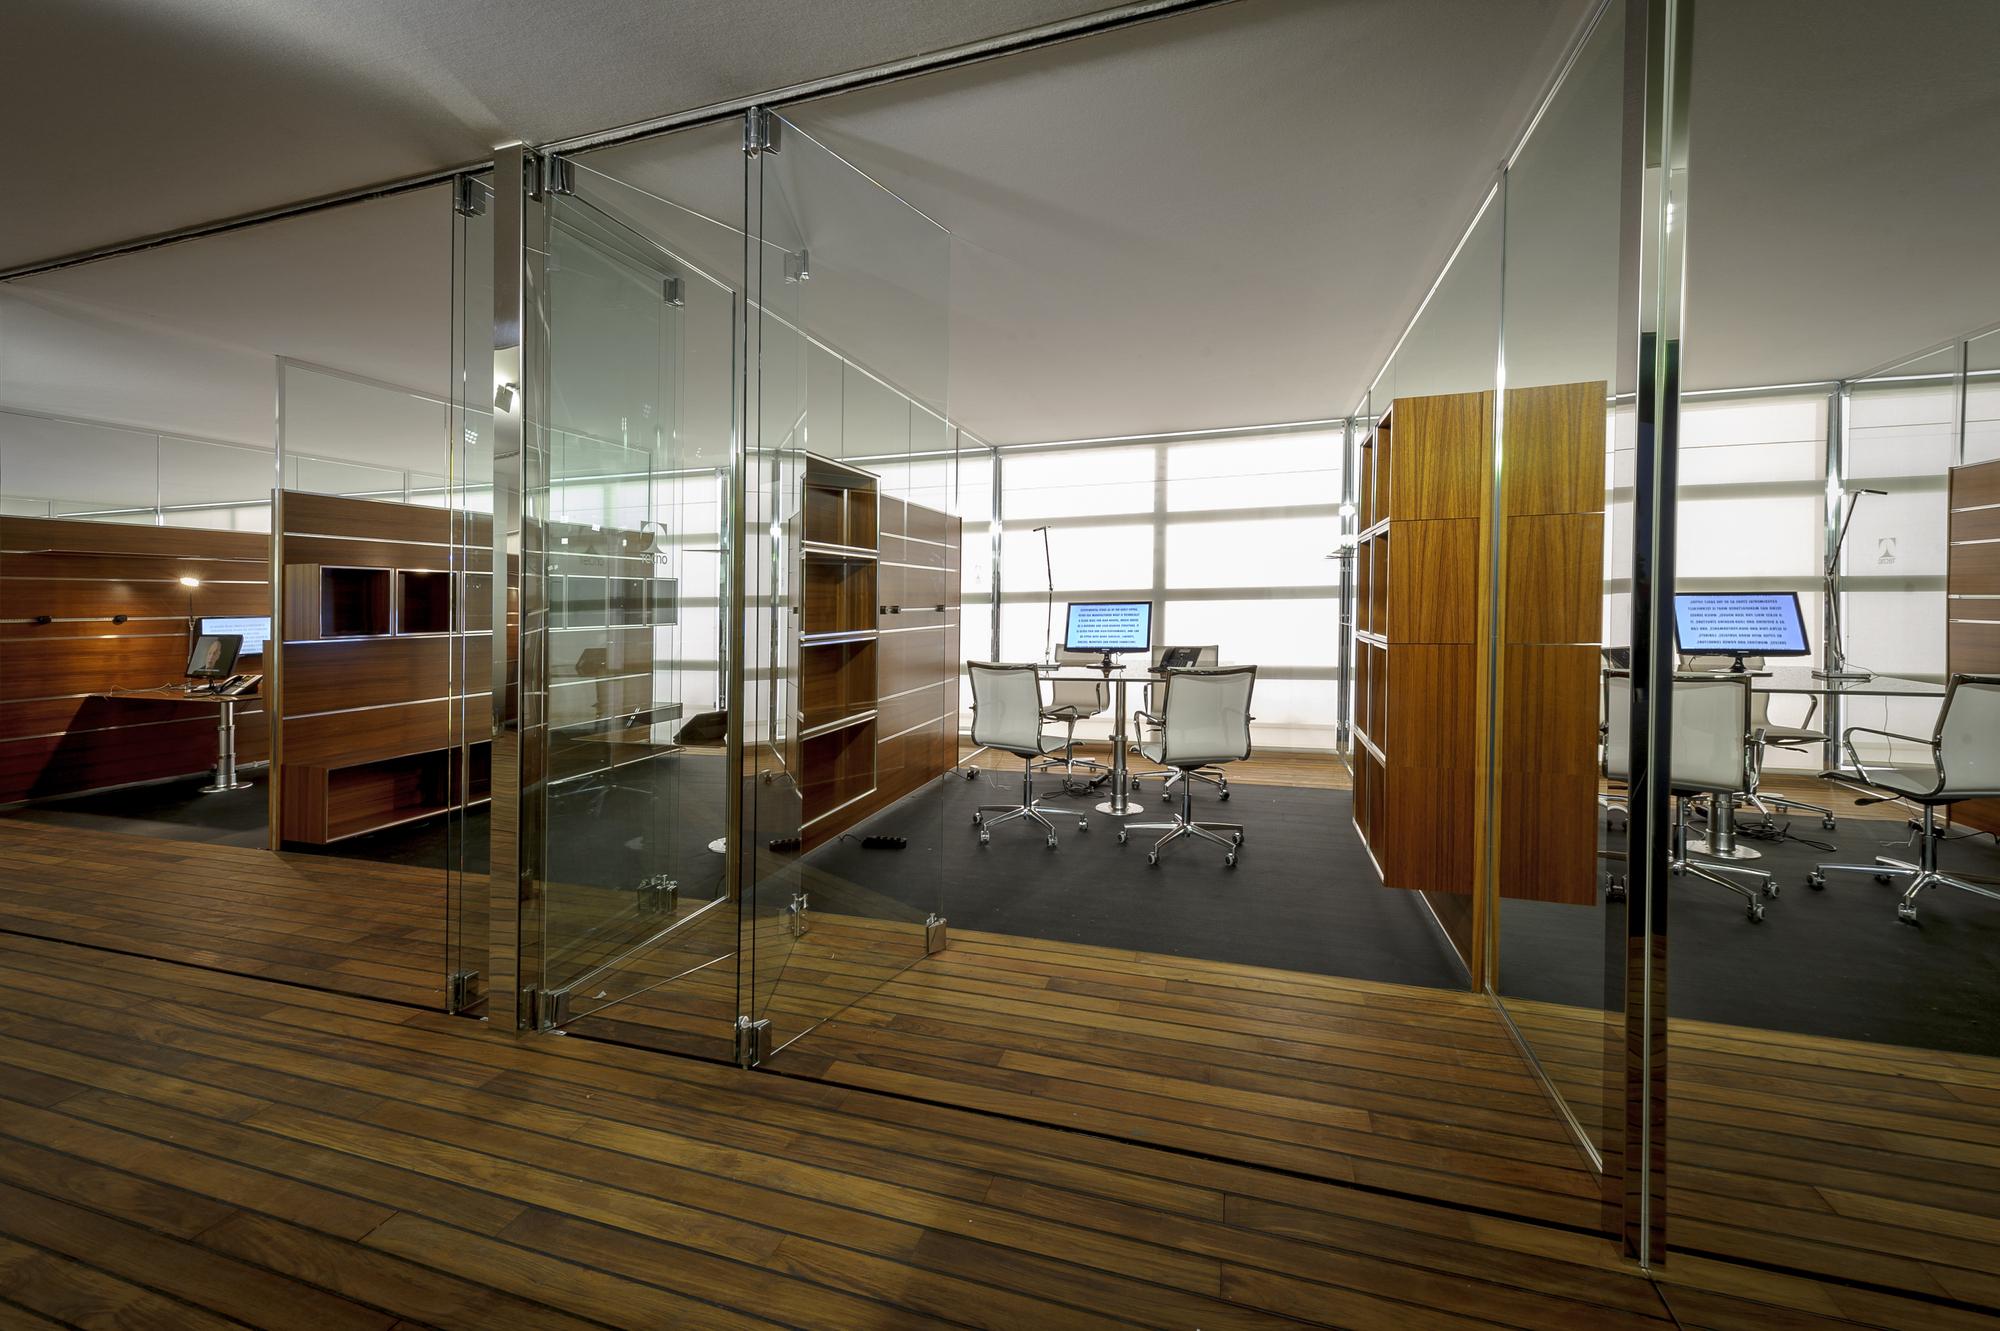 Office for living jean nouvel speculation pinterest for Jean nouvel design